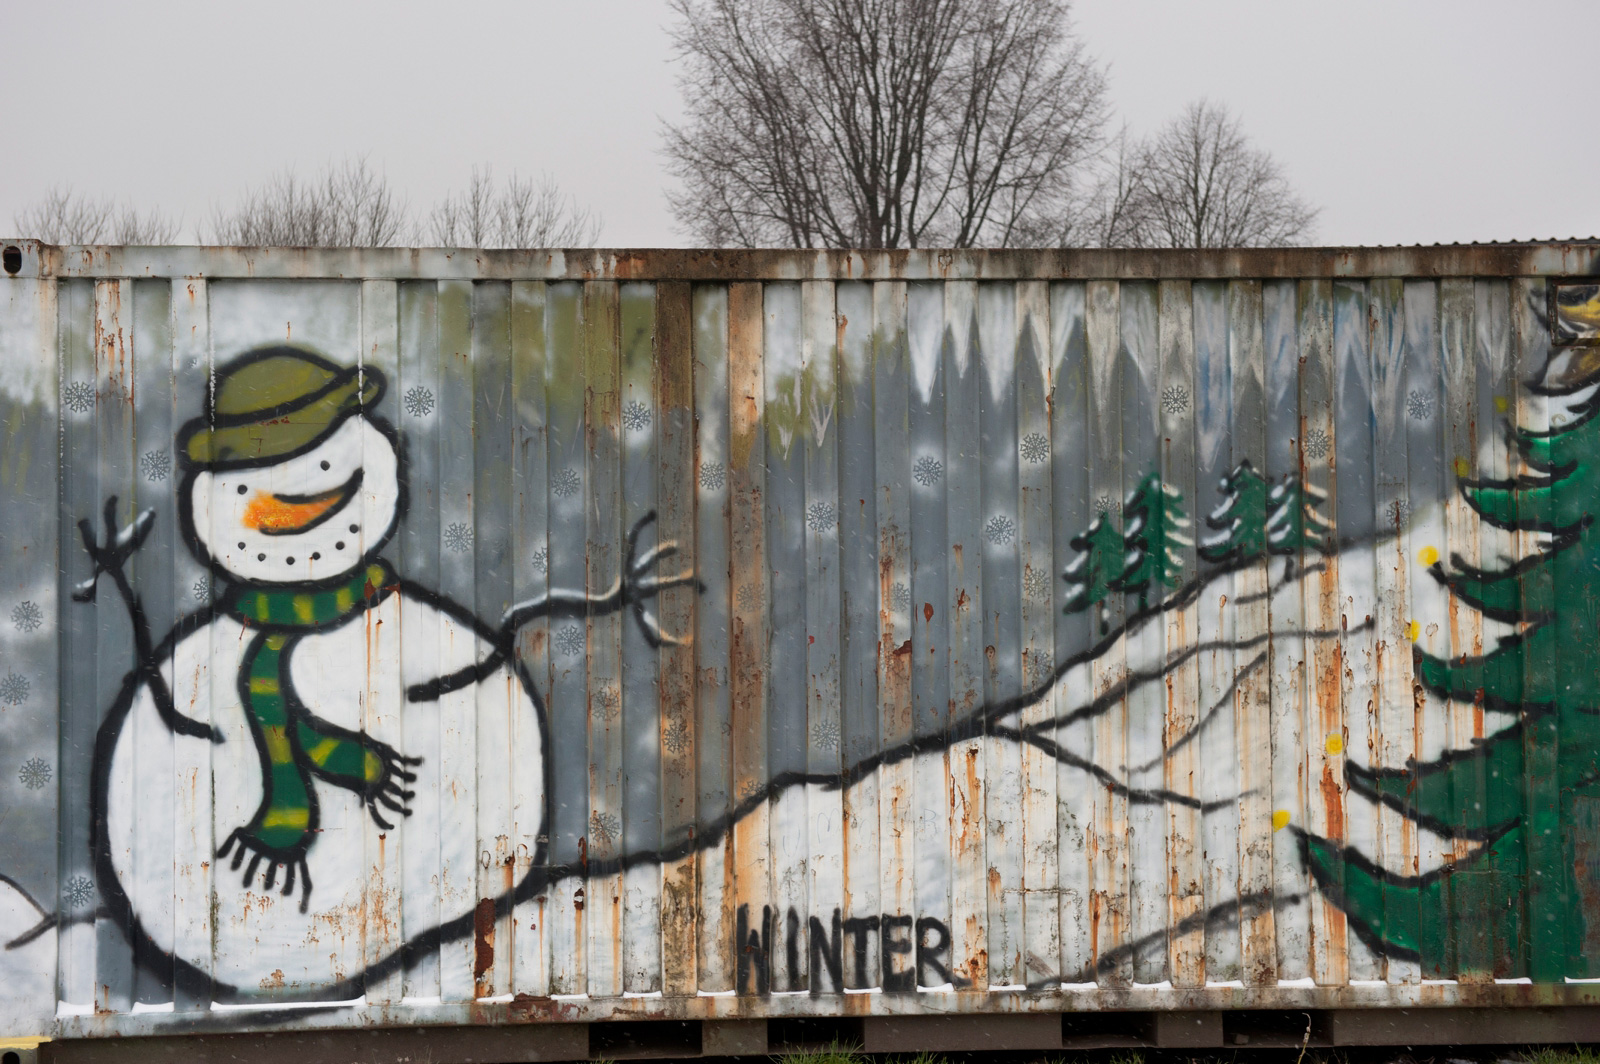 Winter-UK-Jacki-Bruniquel-Travel-Photography001